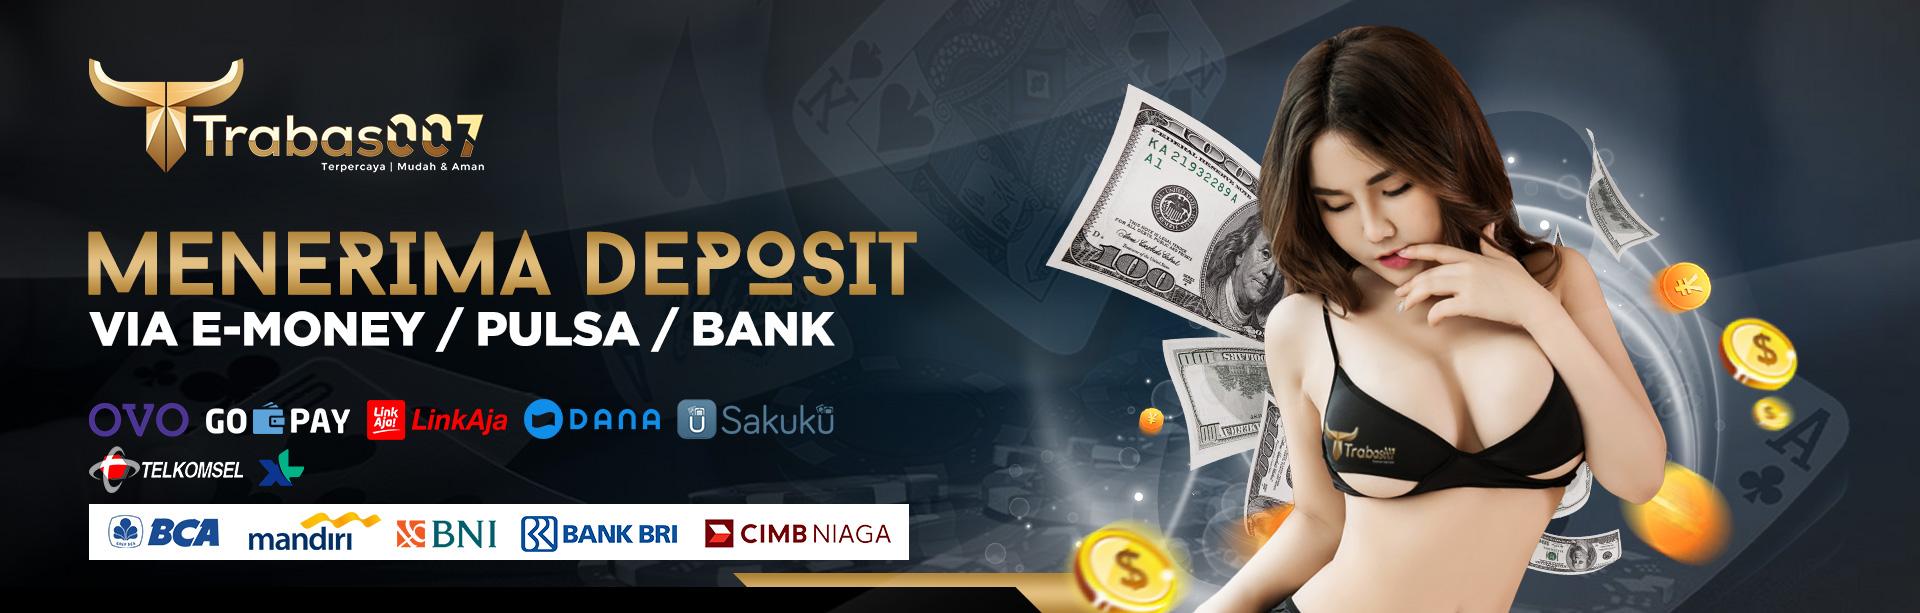 Trabas007 - Deposit Pulsa